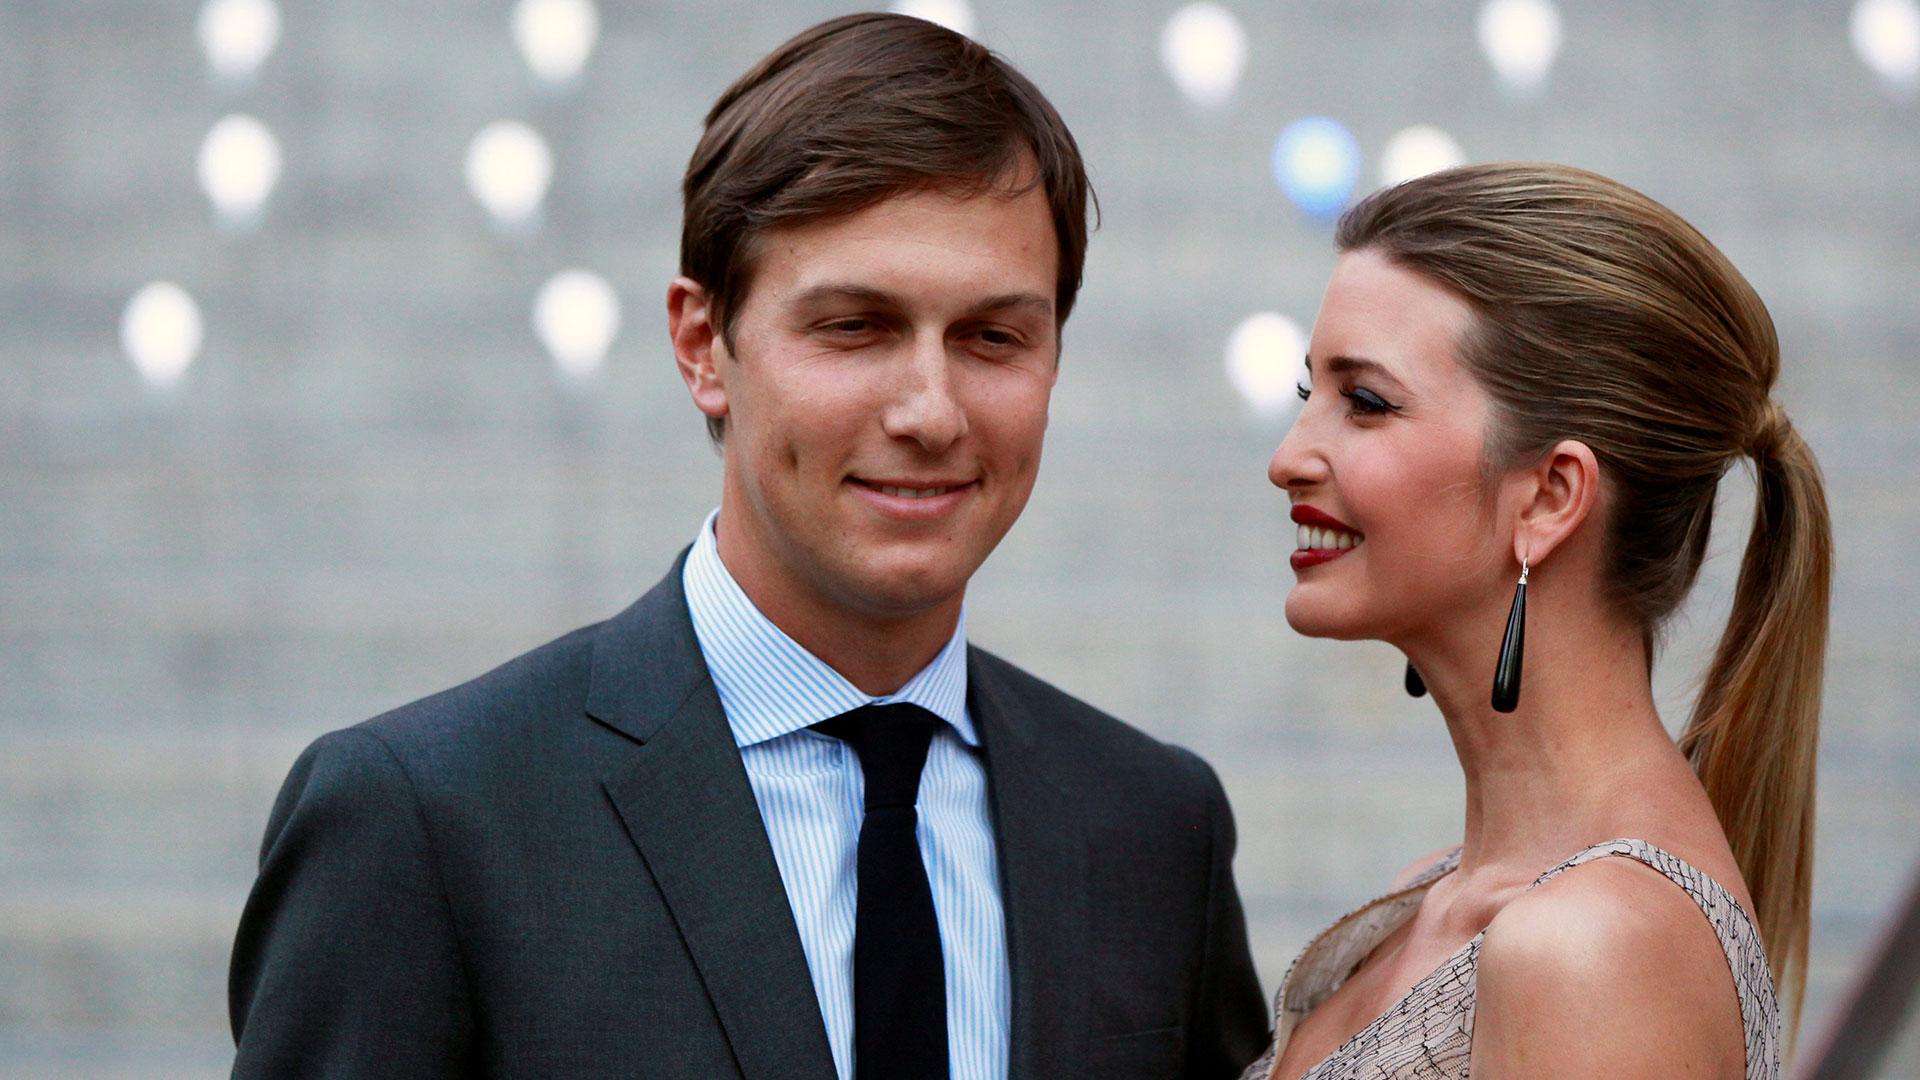 Jared Kushner y su esposa, la hija de Donald Trump, Ivanka